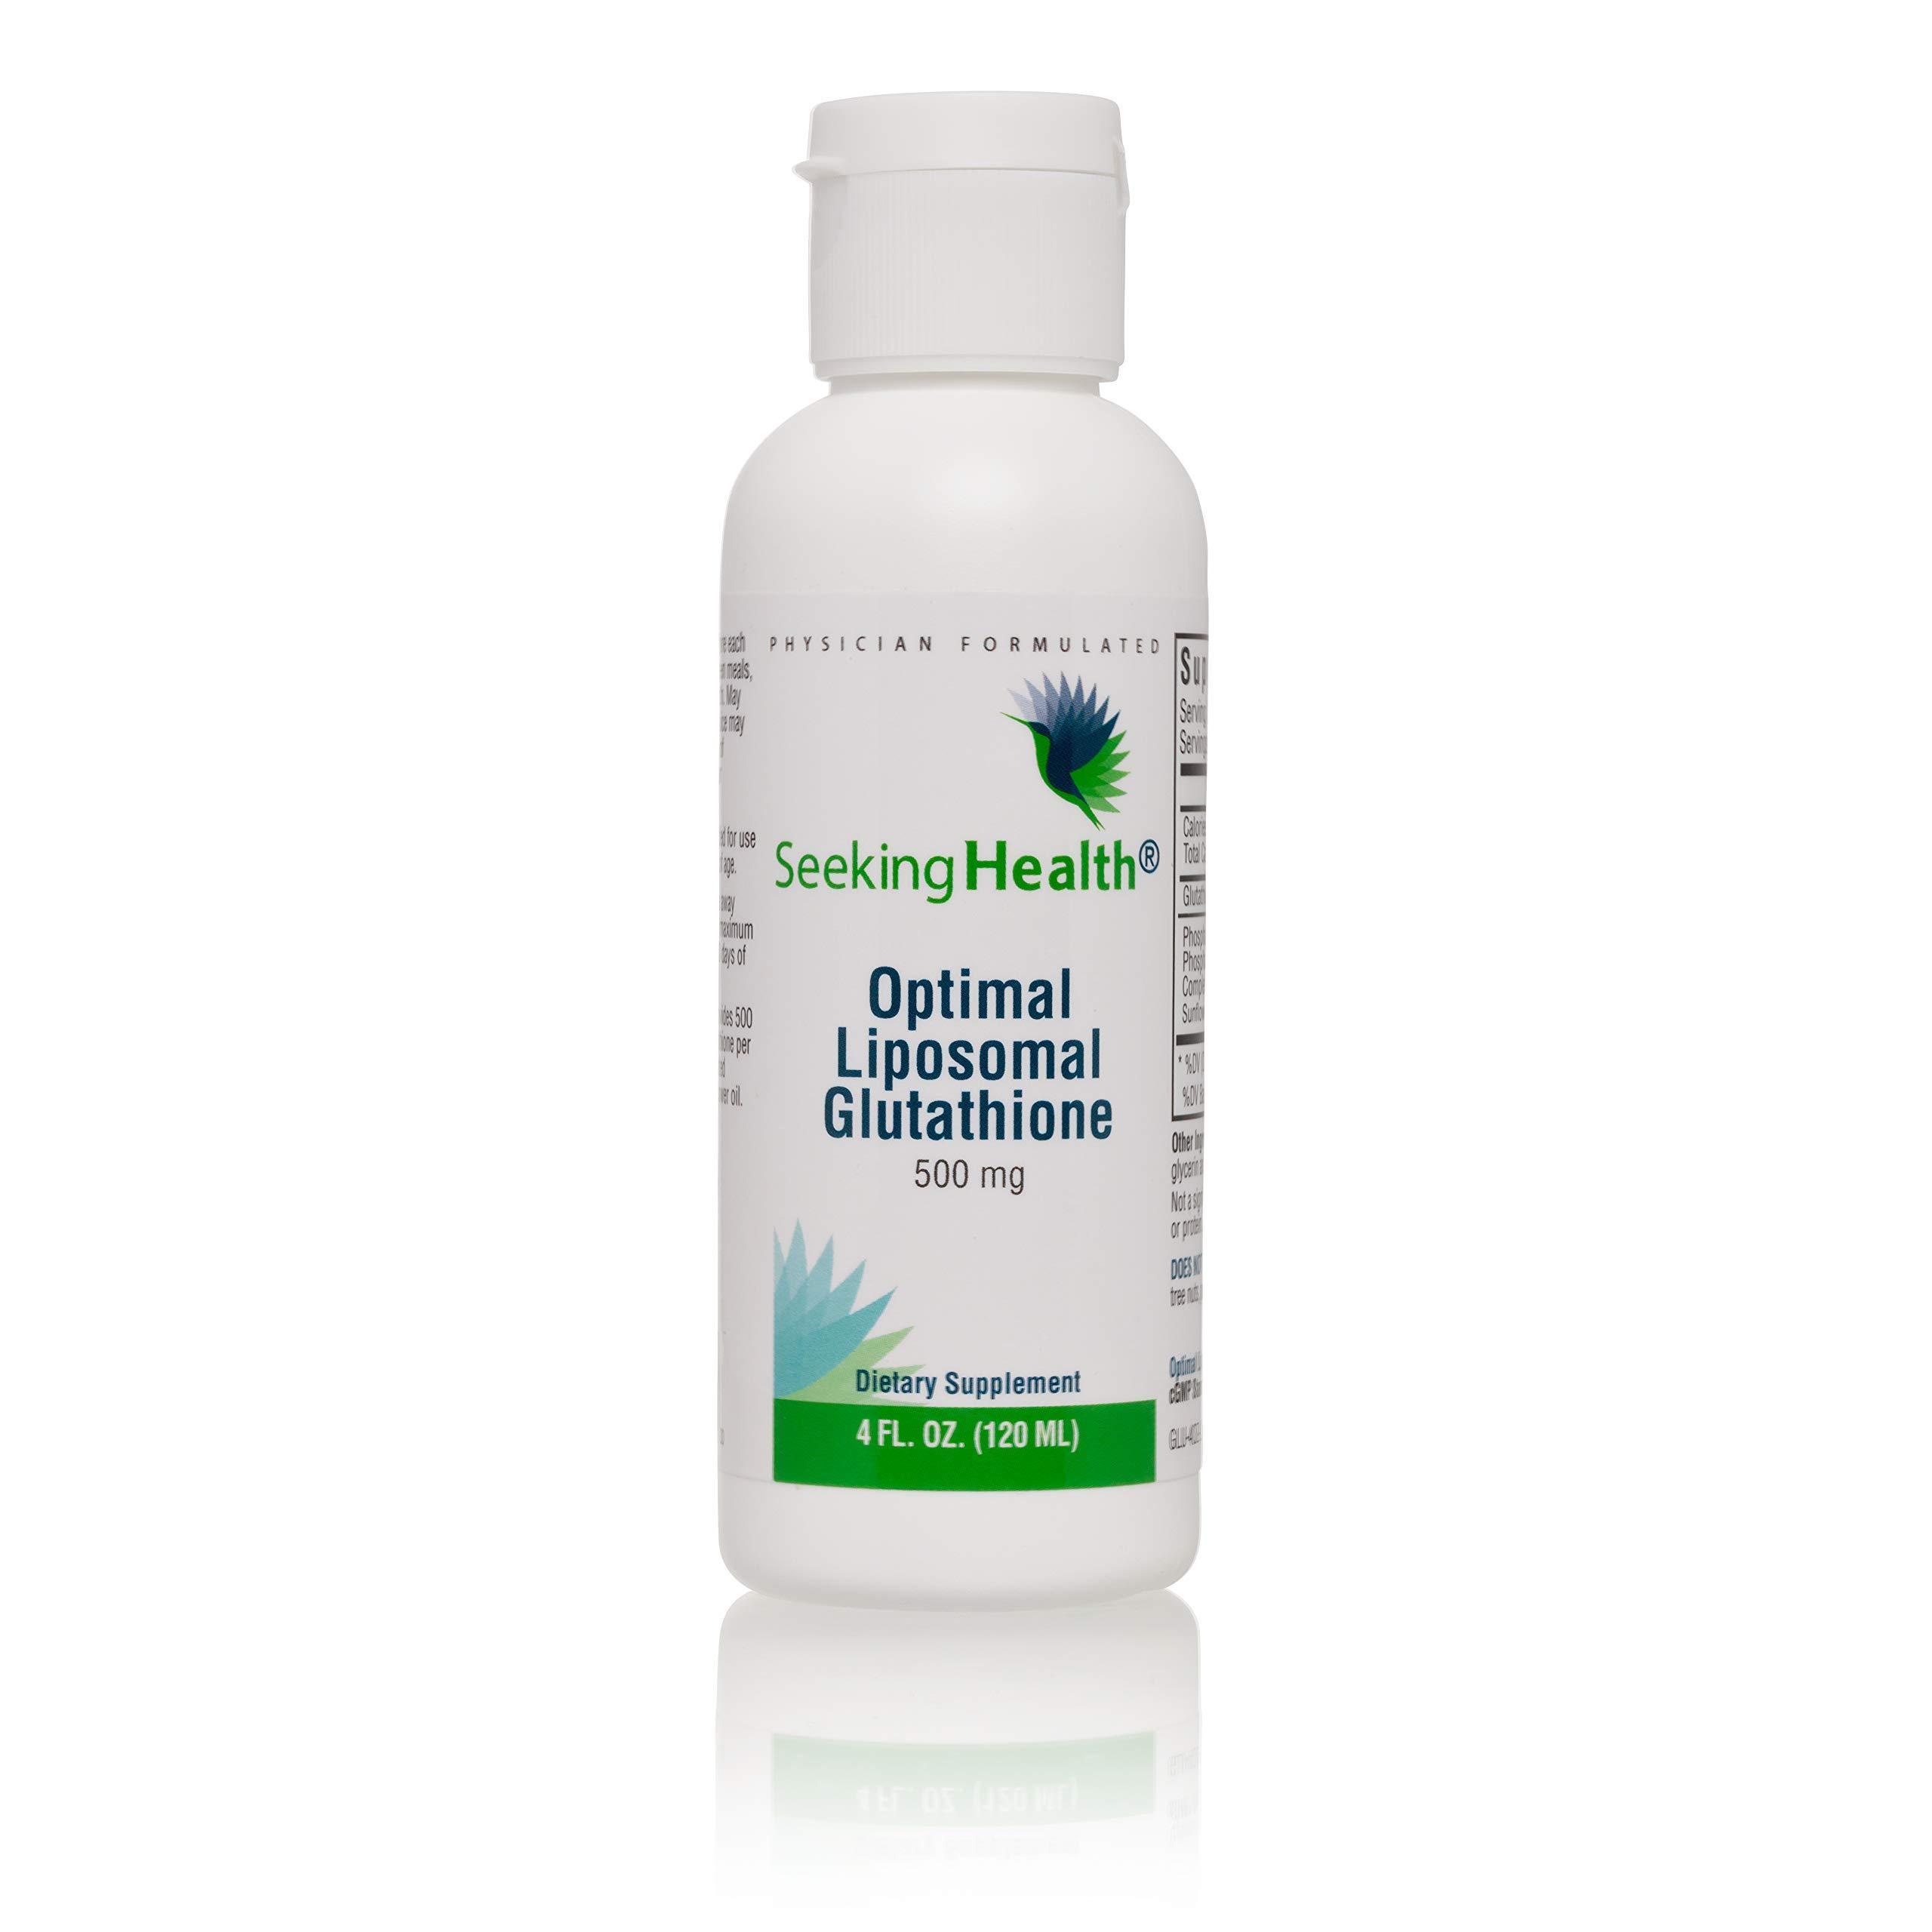 Optimal Liposomal Glutathione | Non-Soy and Non-GMO | Provides 500 mg of Liposomal Glutathione per Teaspoon | 4 oz | 30 Servings